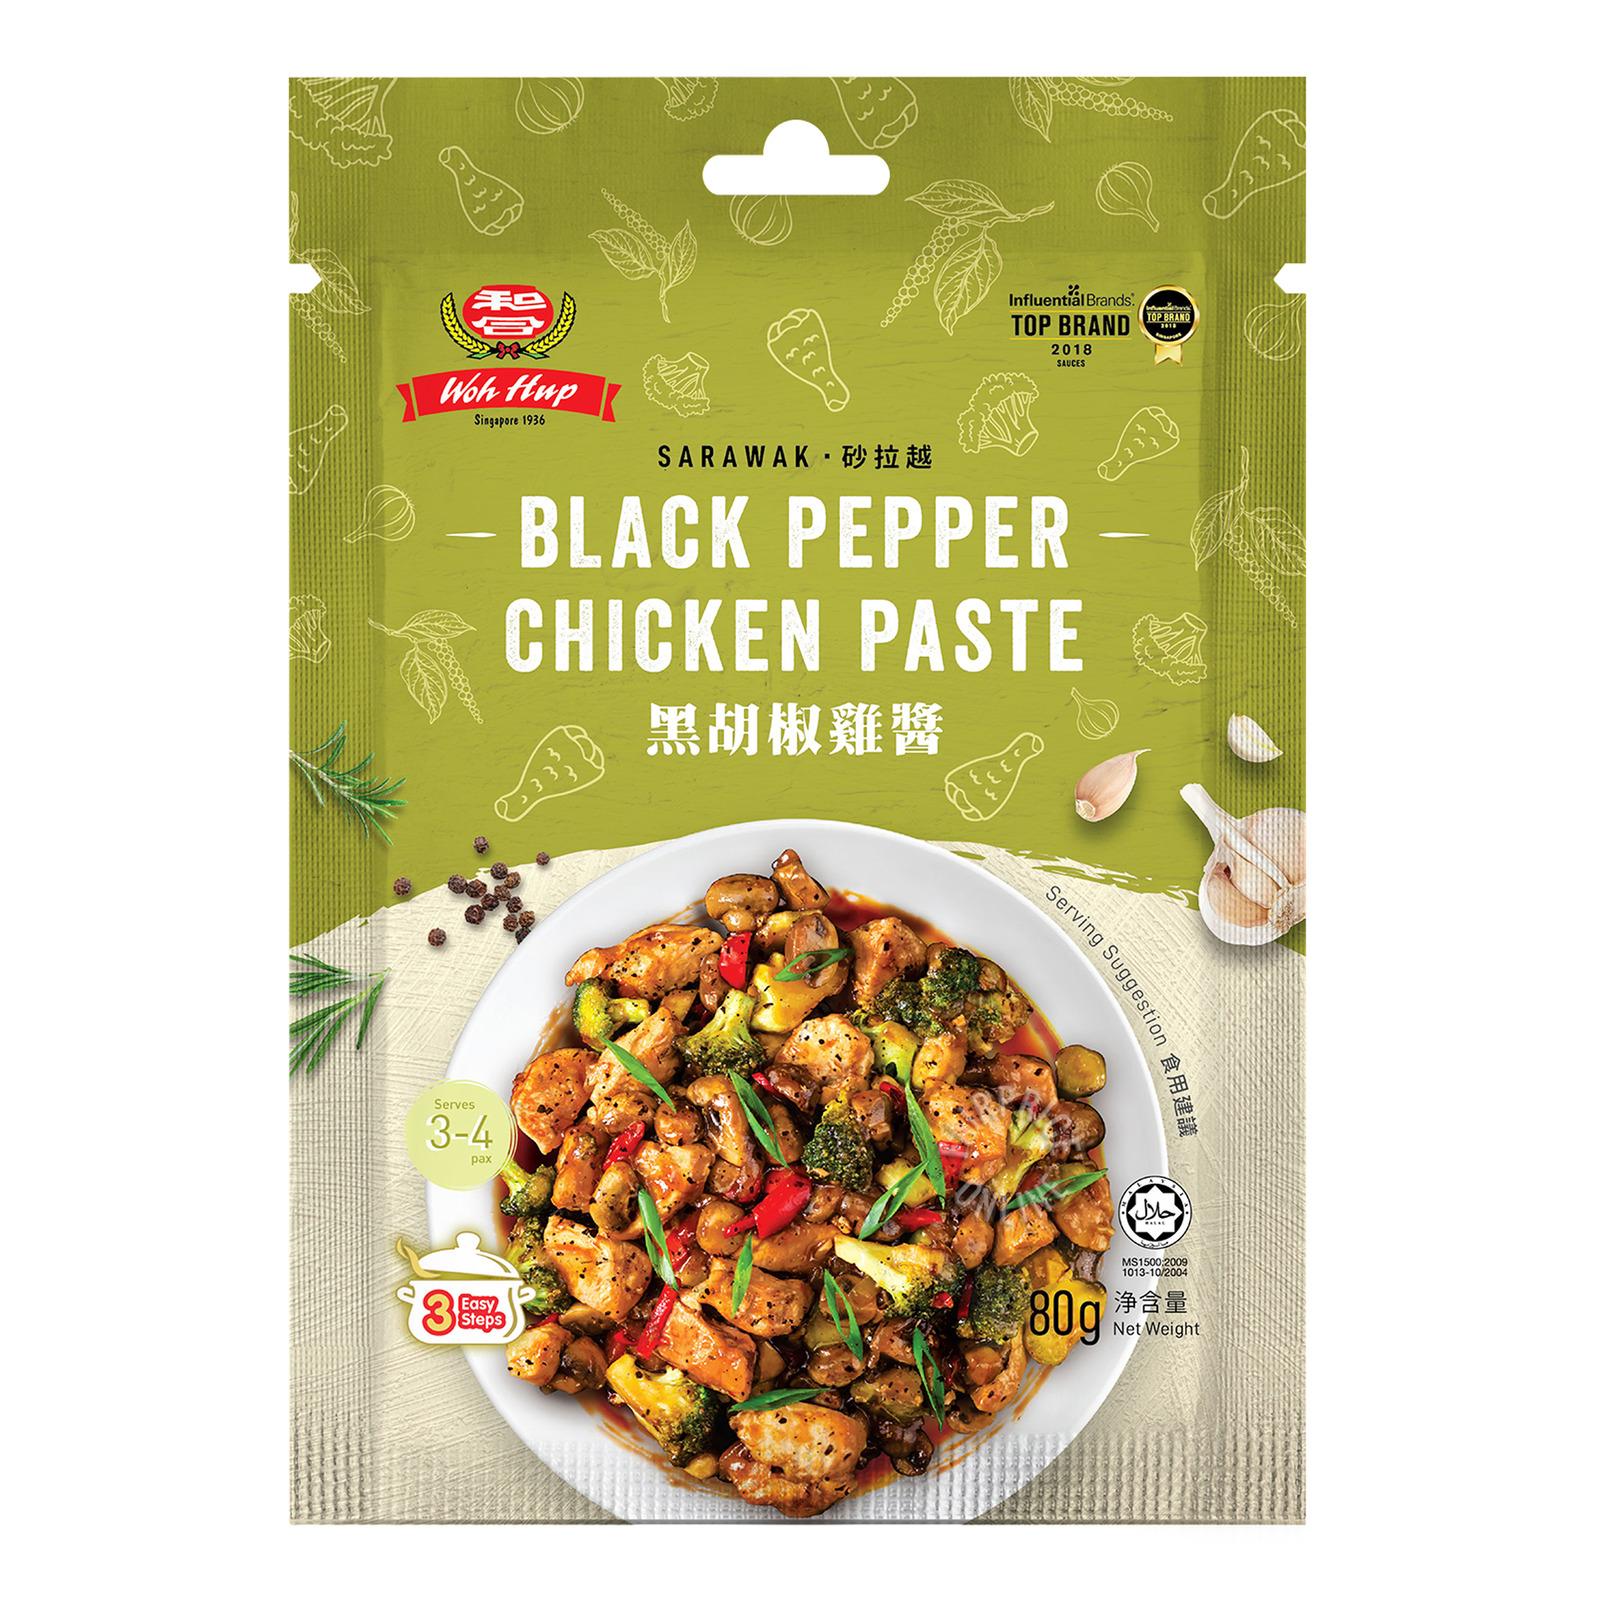 Woh Hup Cooking Paste - Sarawak Black Pepper Chicken